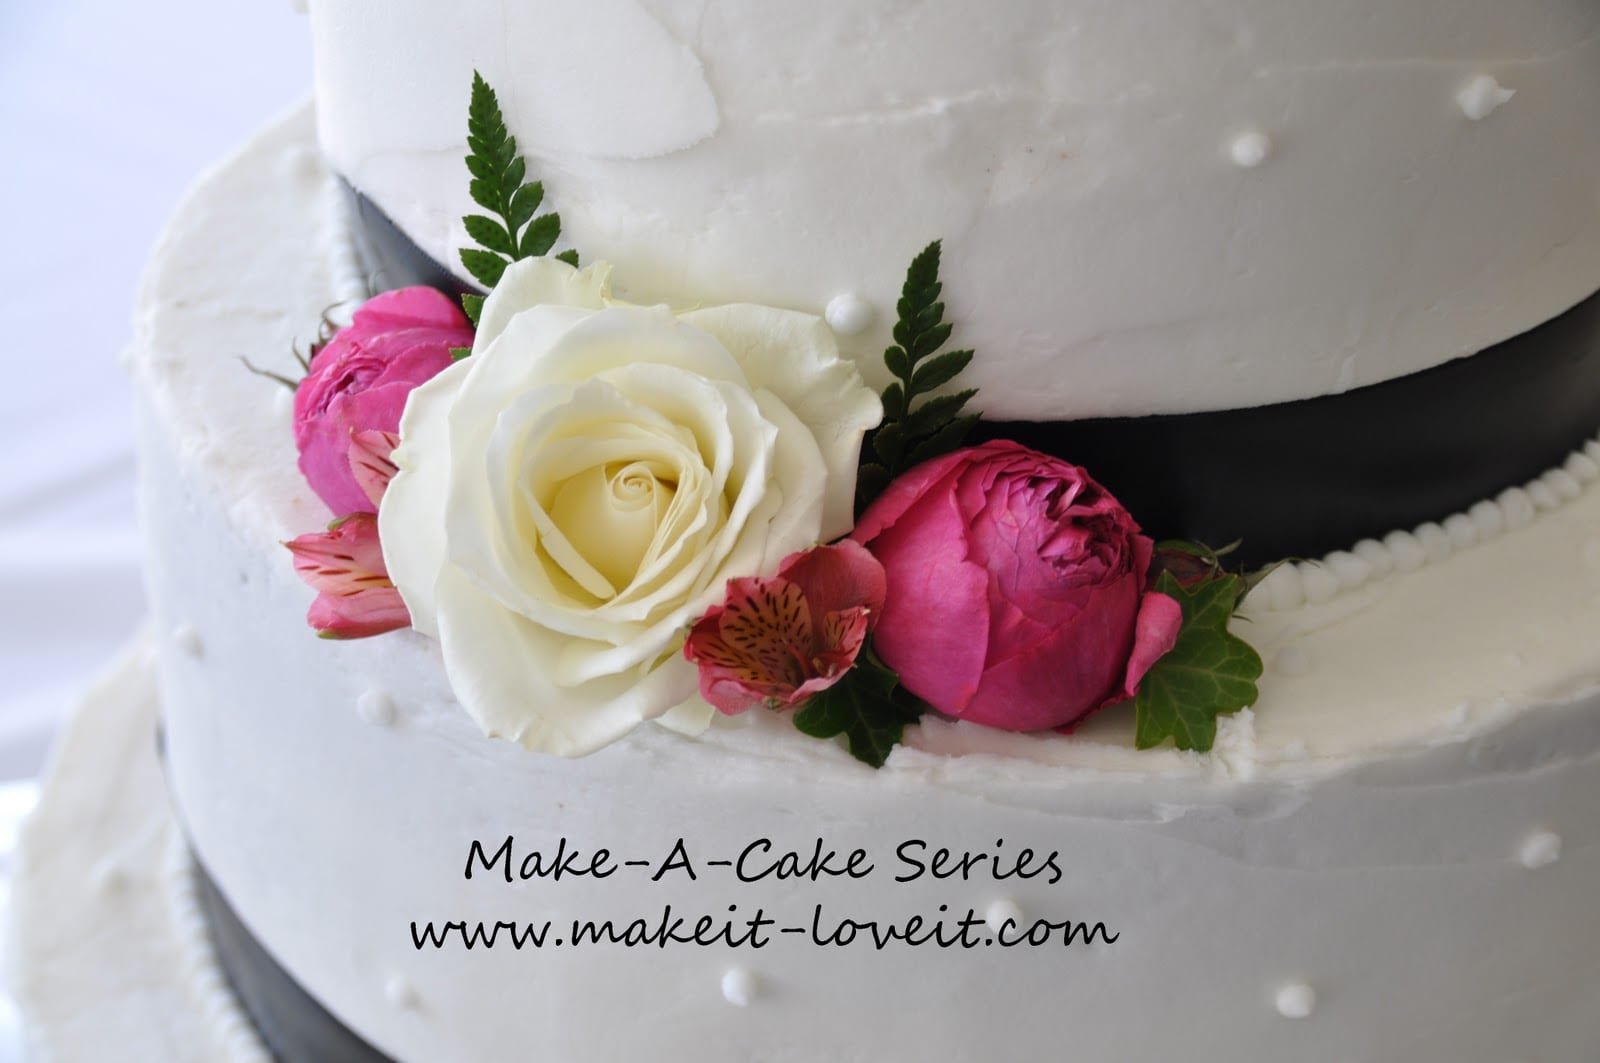 Make-a-Cake Series: Wedding Cakes